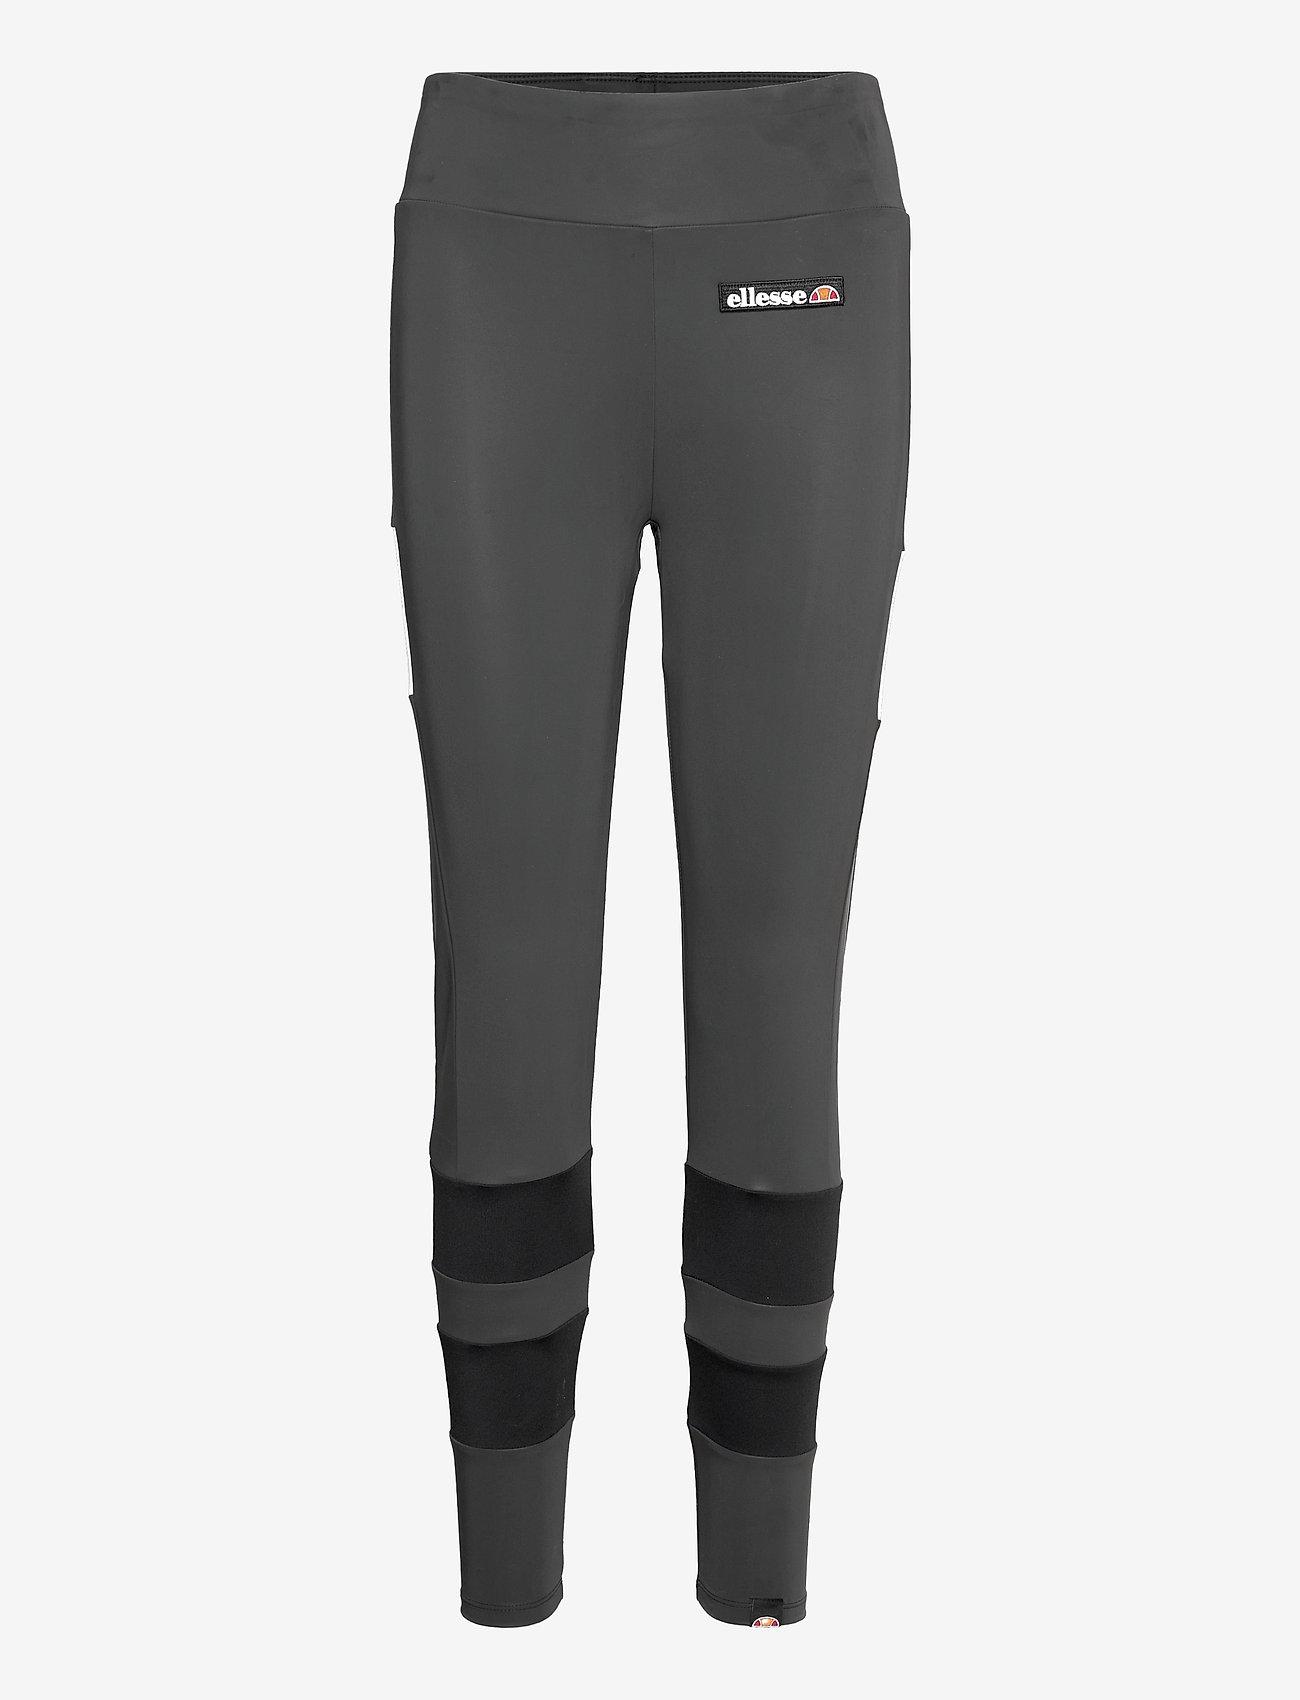 Ellesse - EL PEREZI LEGGING - running & training tights - black - 0